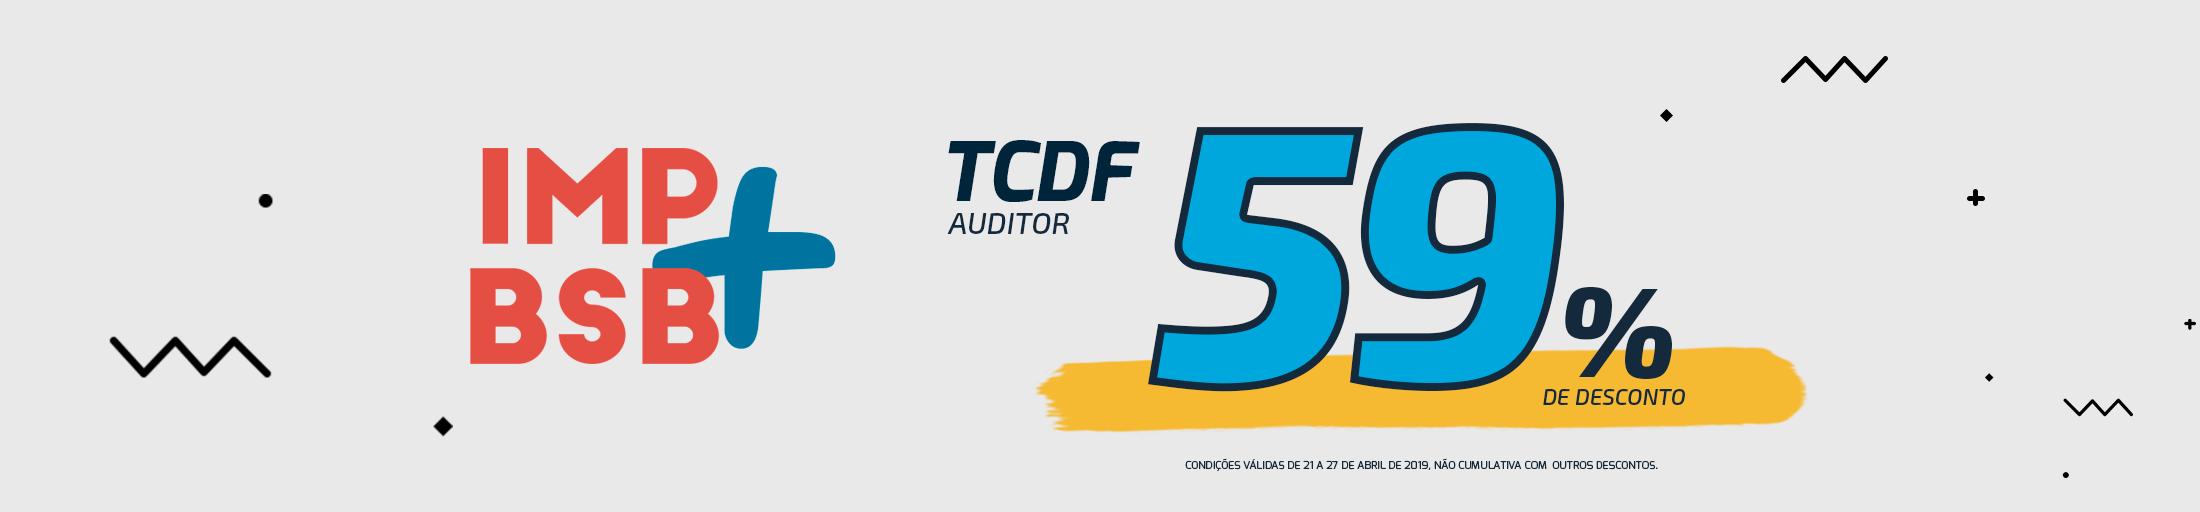 BANNER-SITE-TCDF